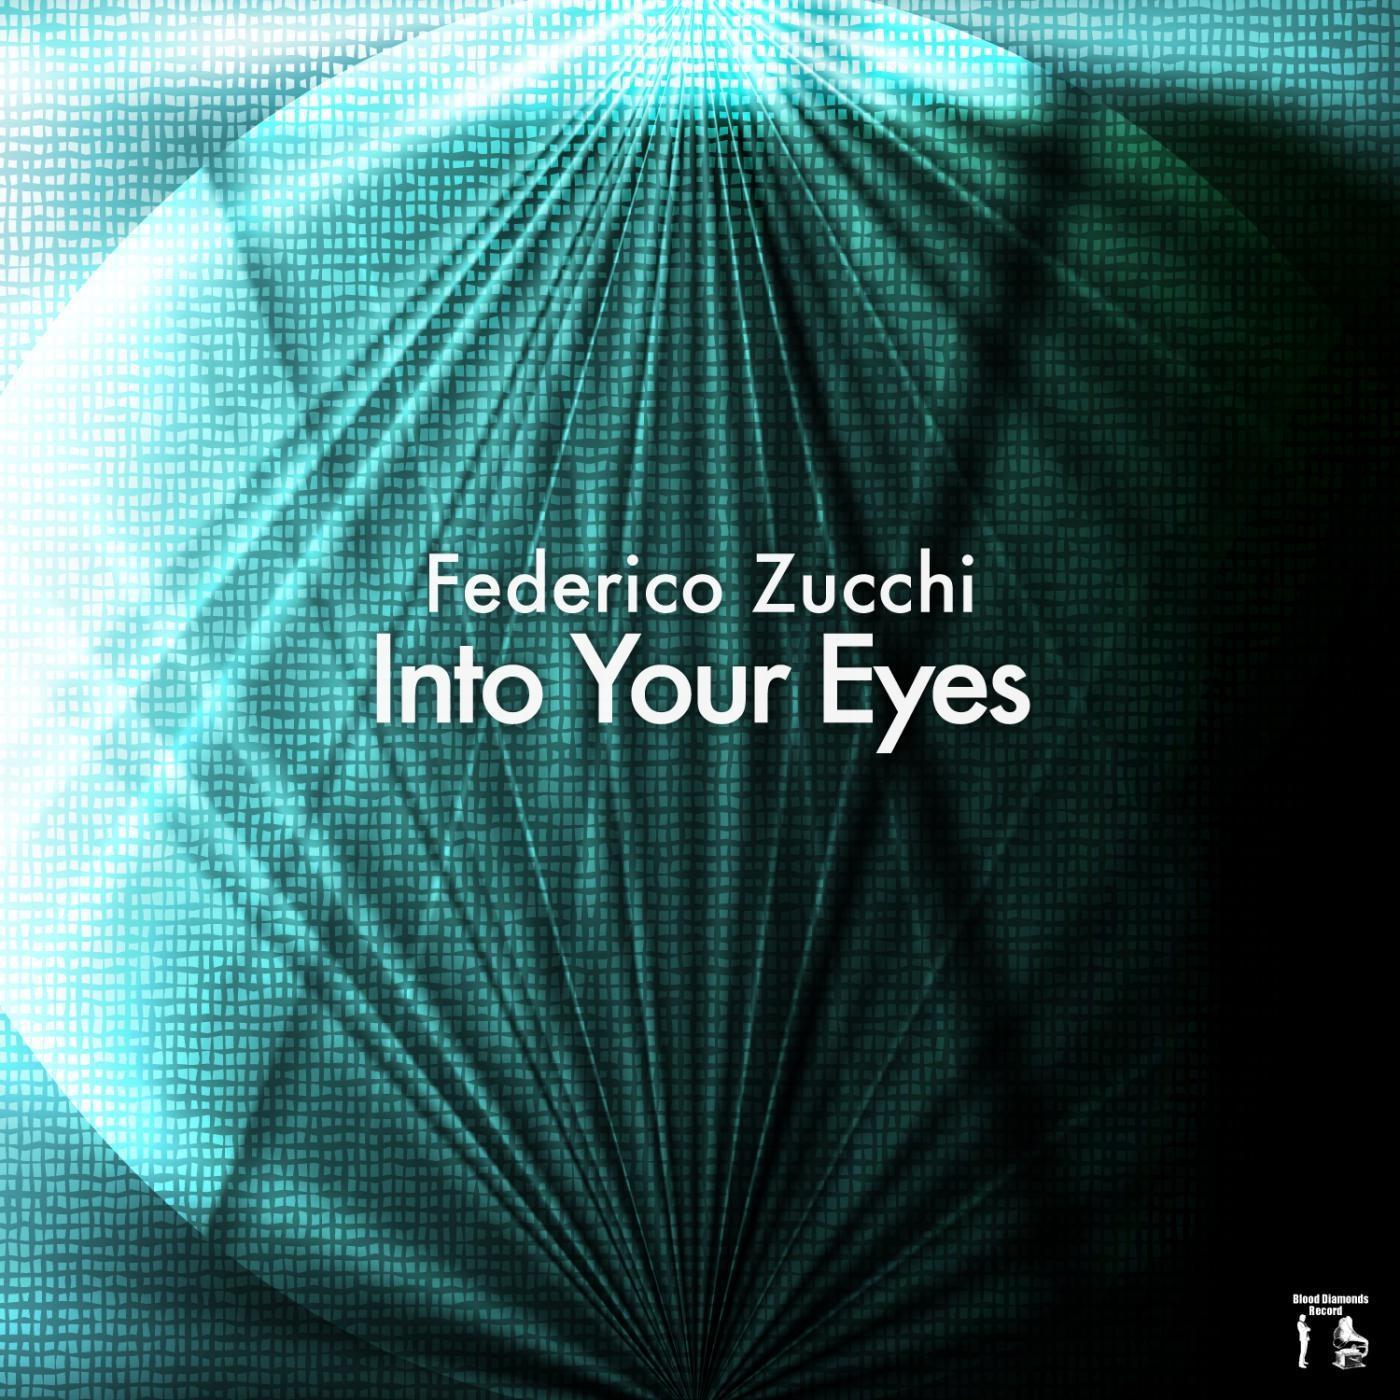 Federico Zucchi - Into Your Eyes (Original mix)